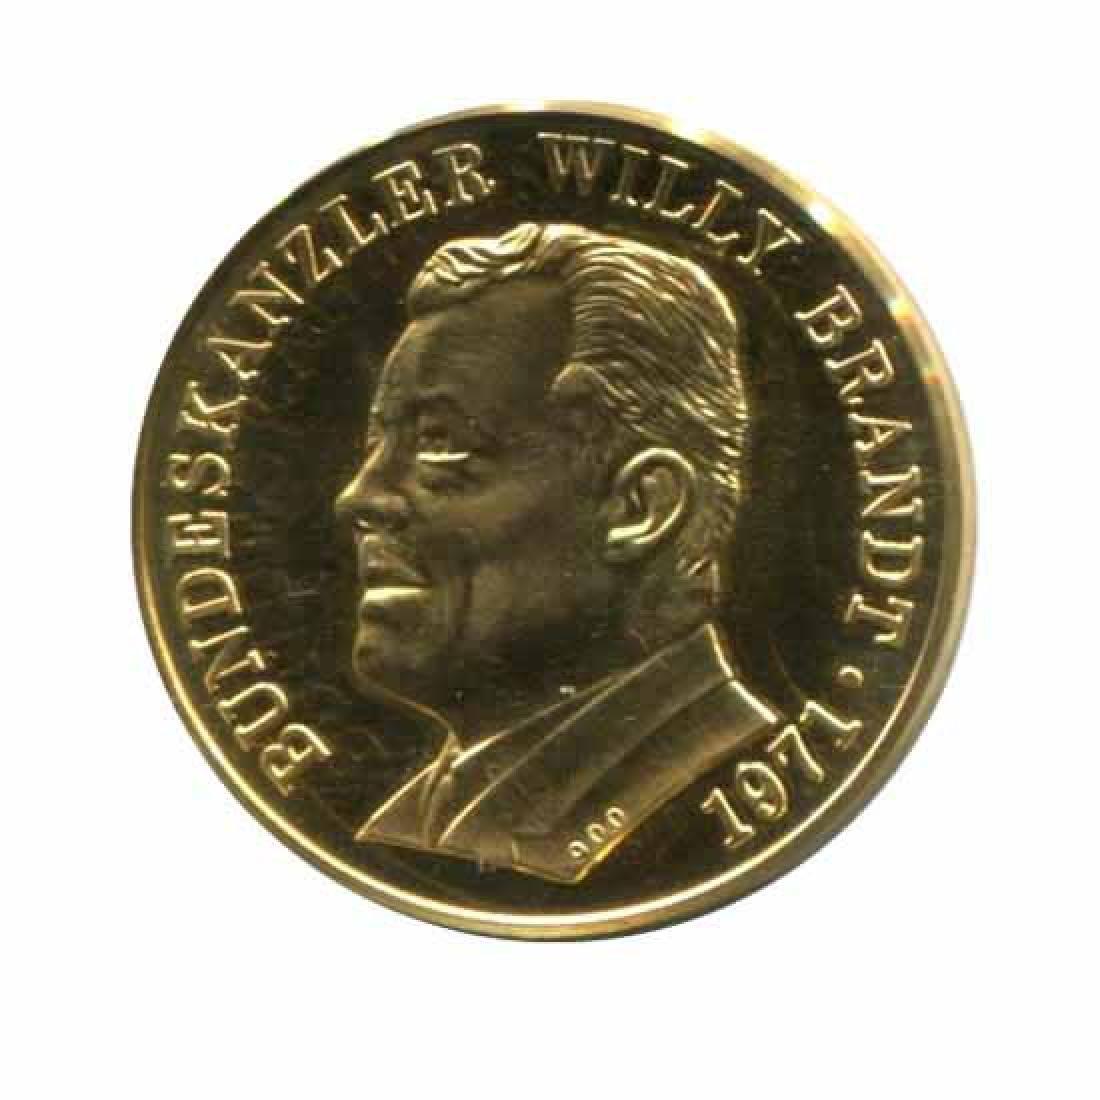 Germany Willy Brandt Gold Medal Nobel Peace Prize 1971